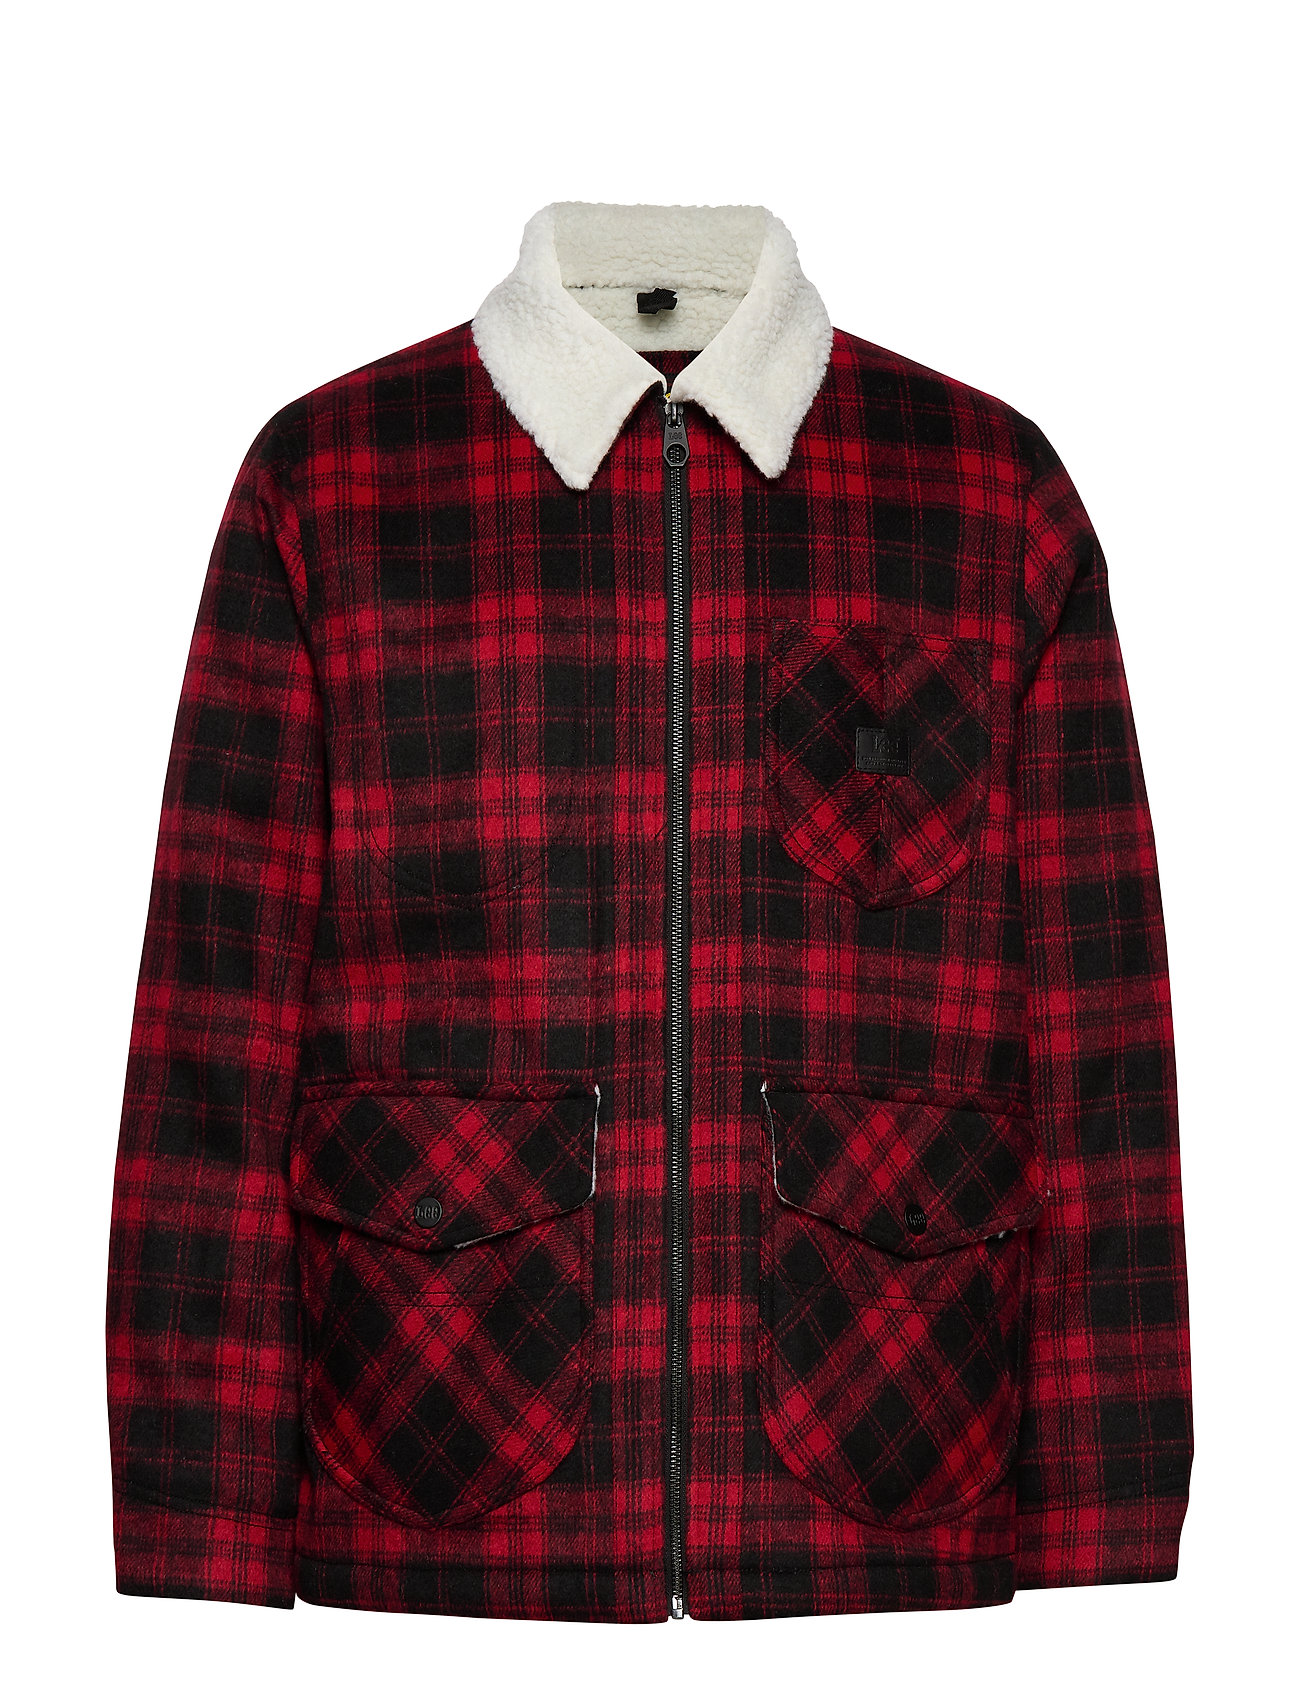 Lee Jeans WOOL LOCO SHERPA - WARP RED